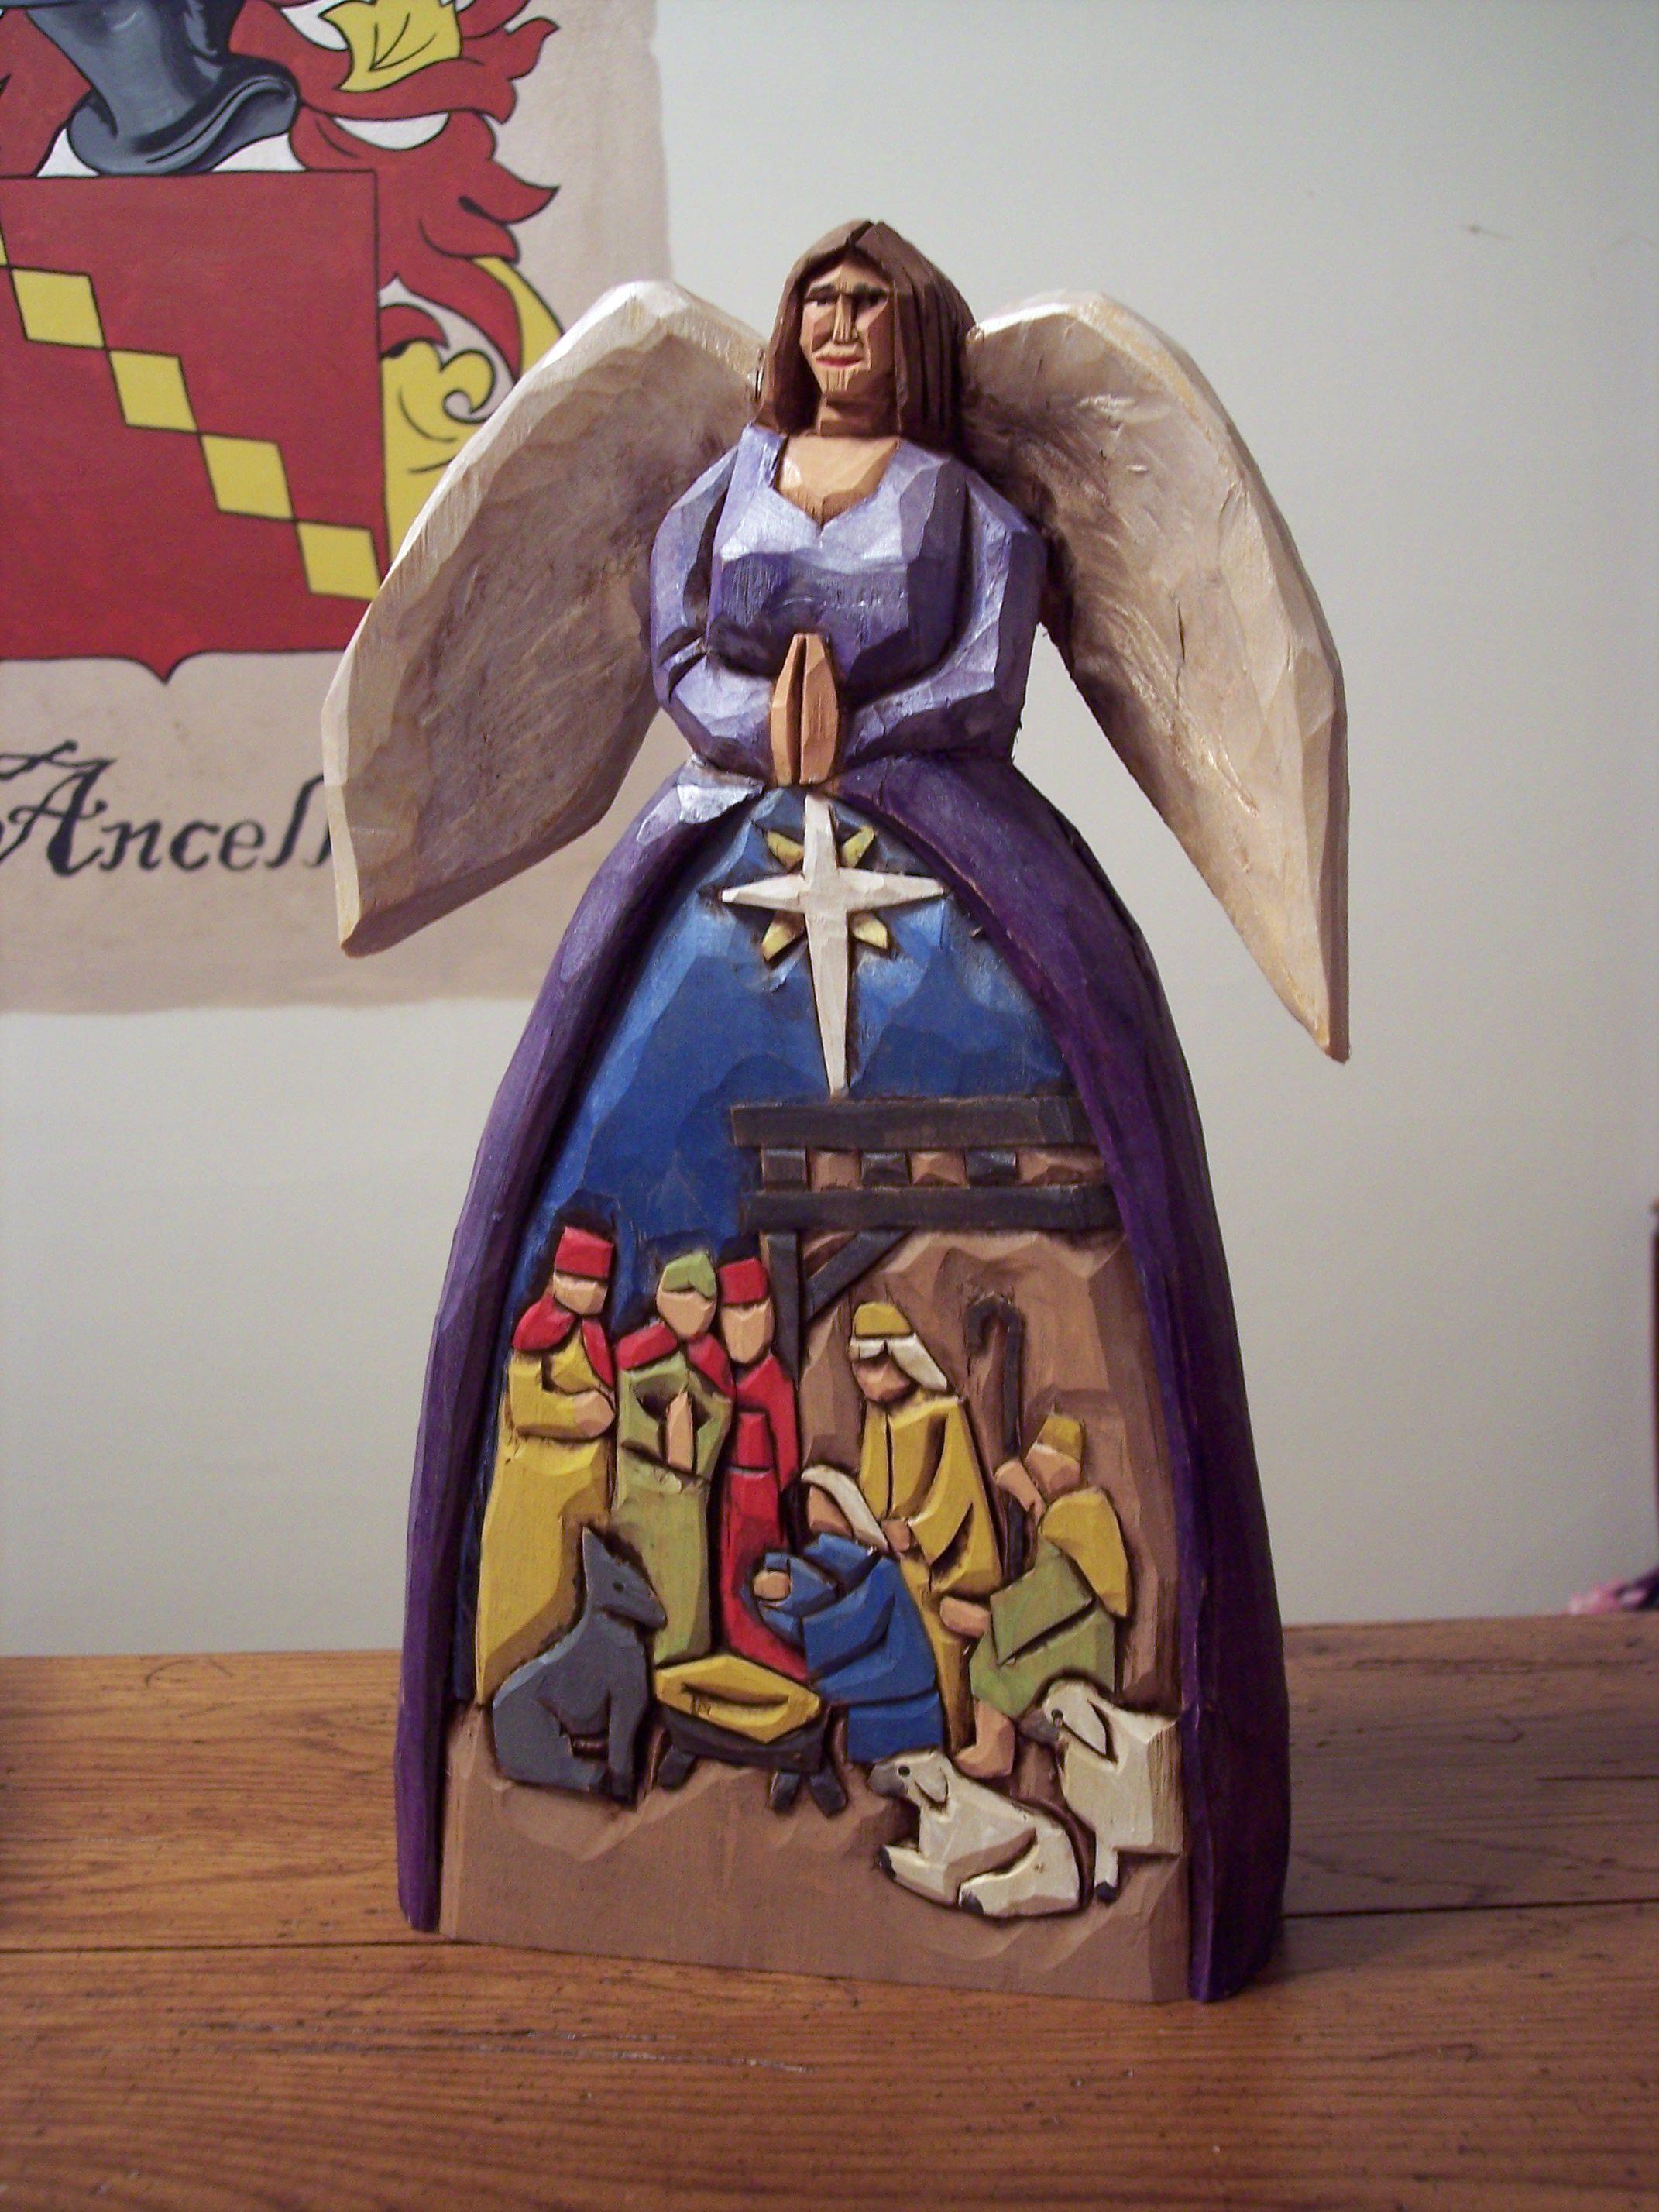 Carving Angels Ornament